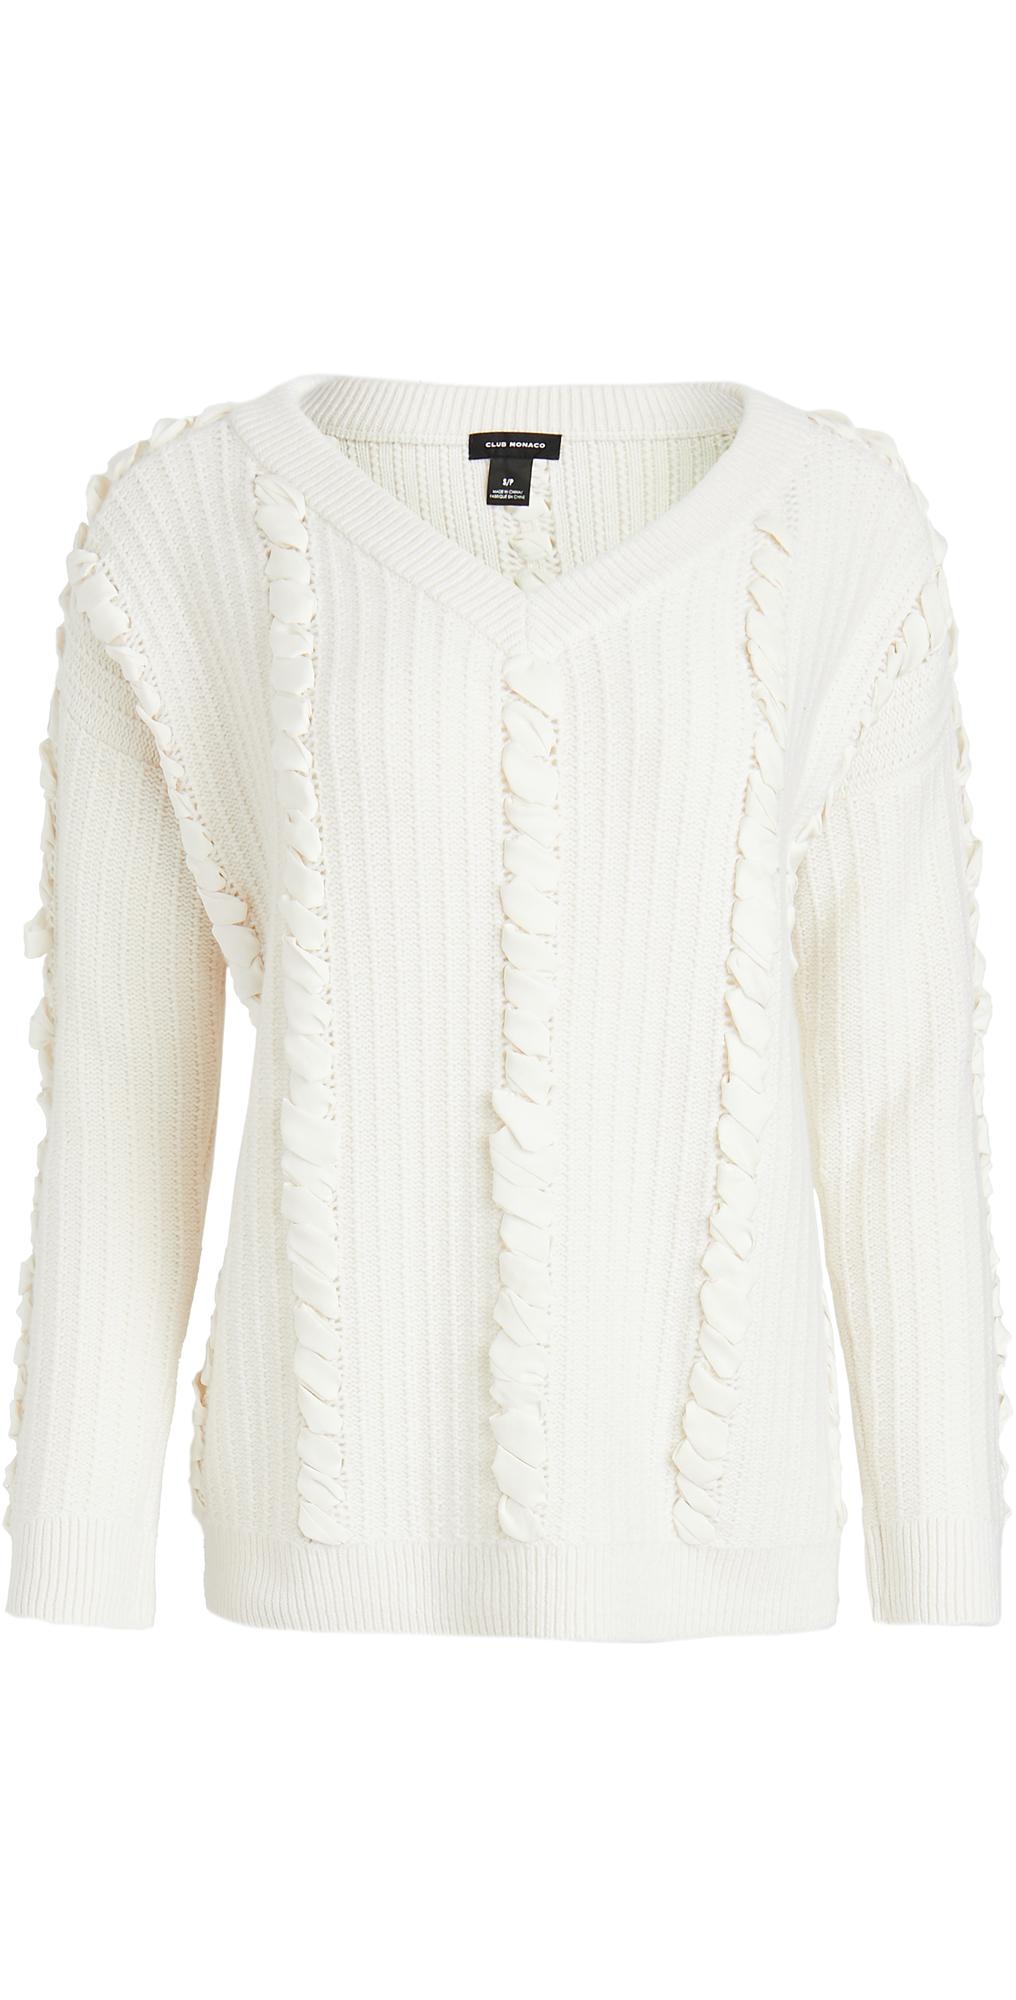 Club Monaco Woven Detail Sweater